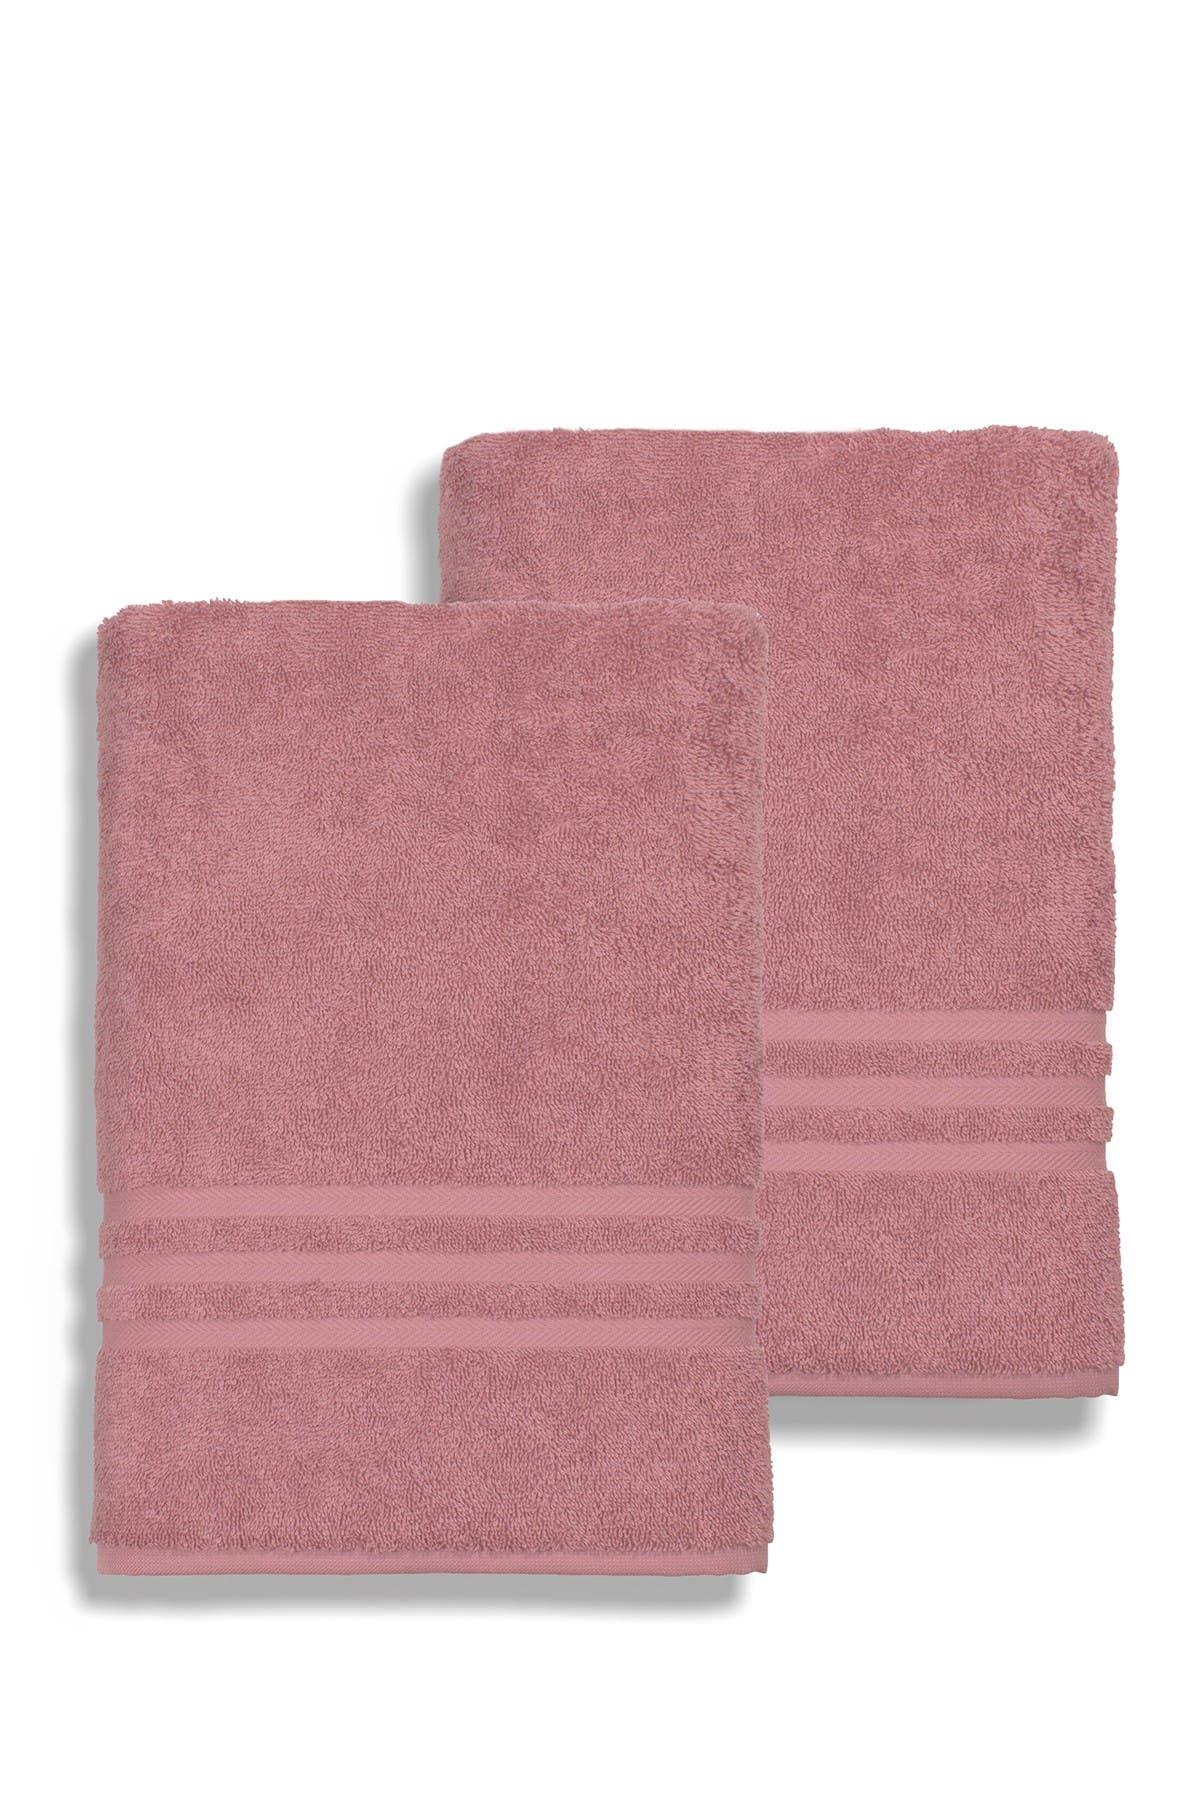 Image of LINUM HOME Denzi Bath Sheet - Set of 2 - Tea Rose